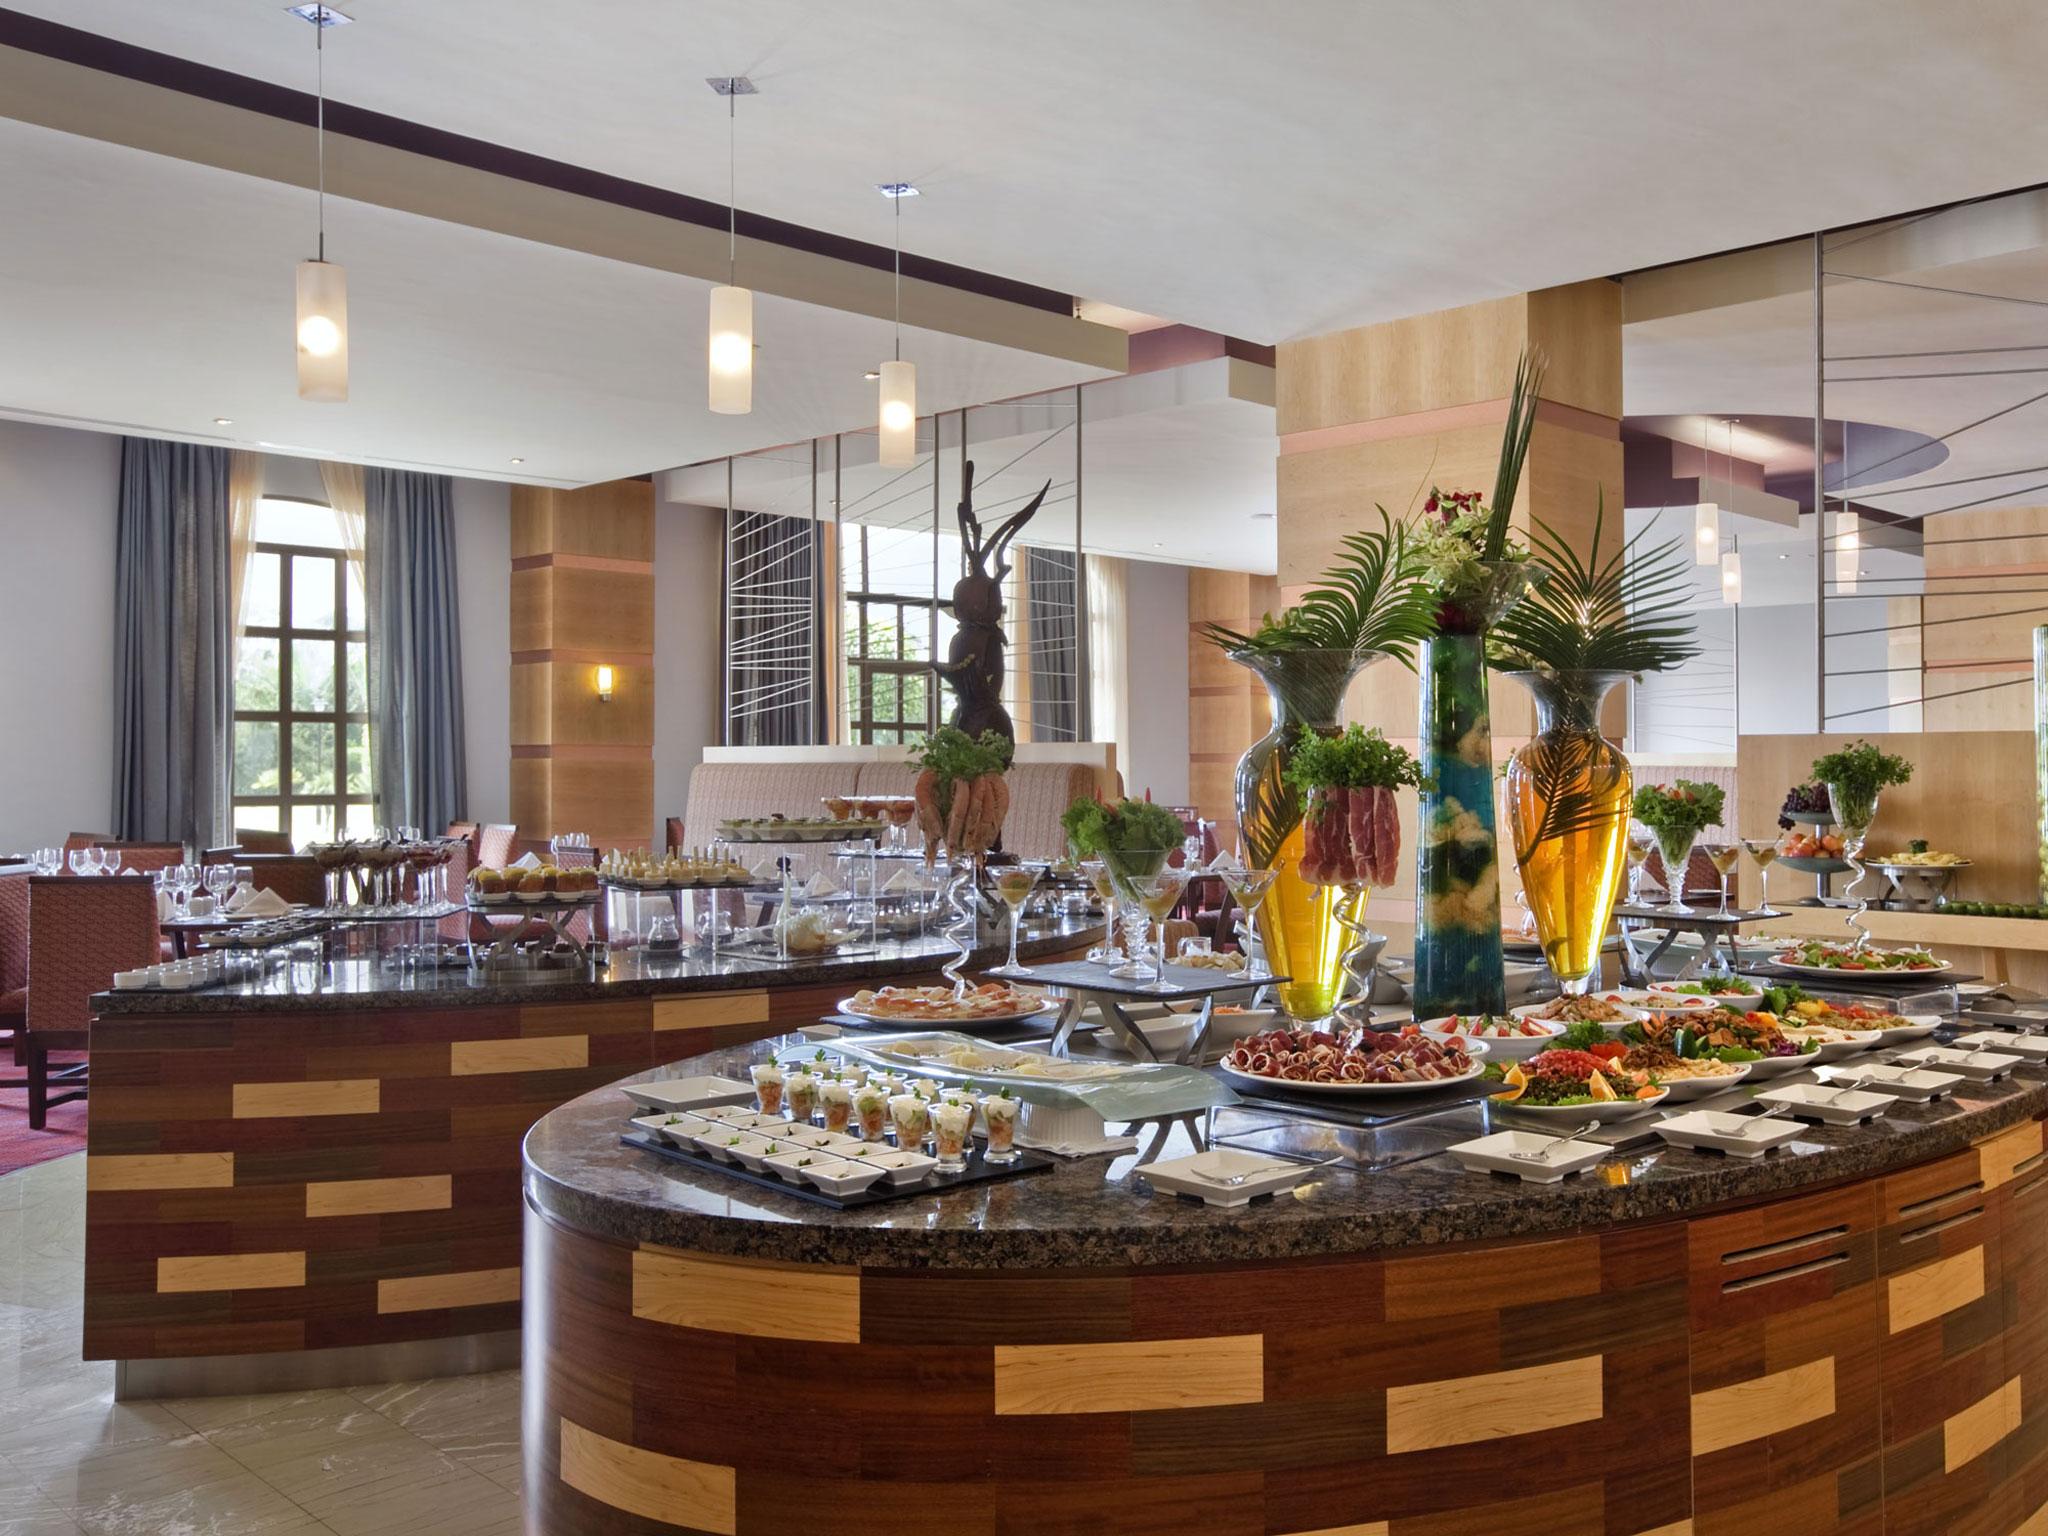 Preview Full 4 Jpg # Salon El Jardin De Diez Irapuato